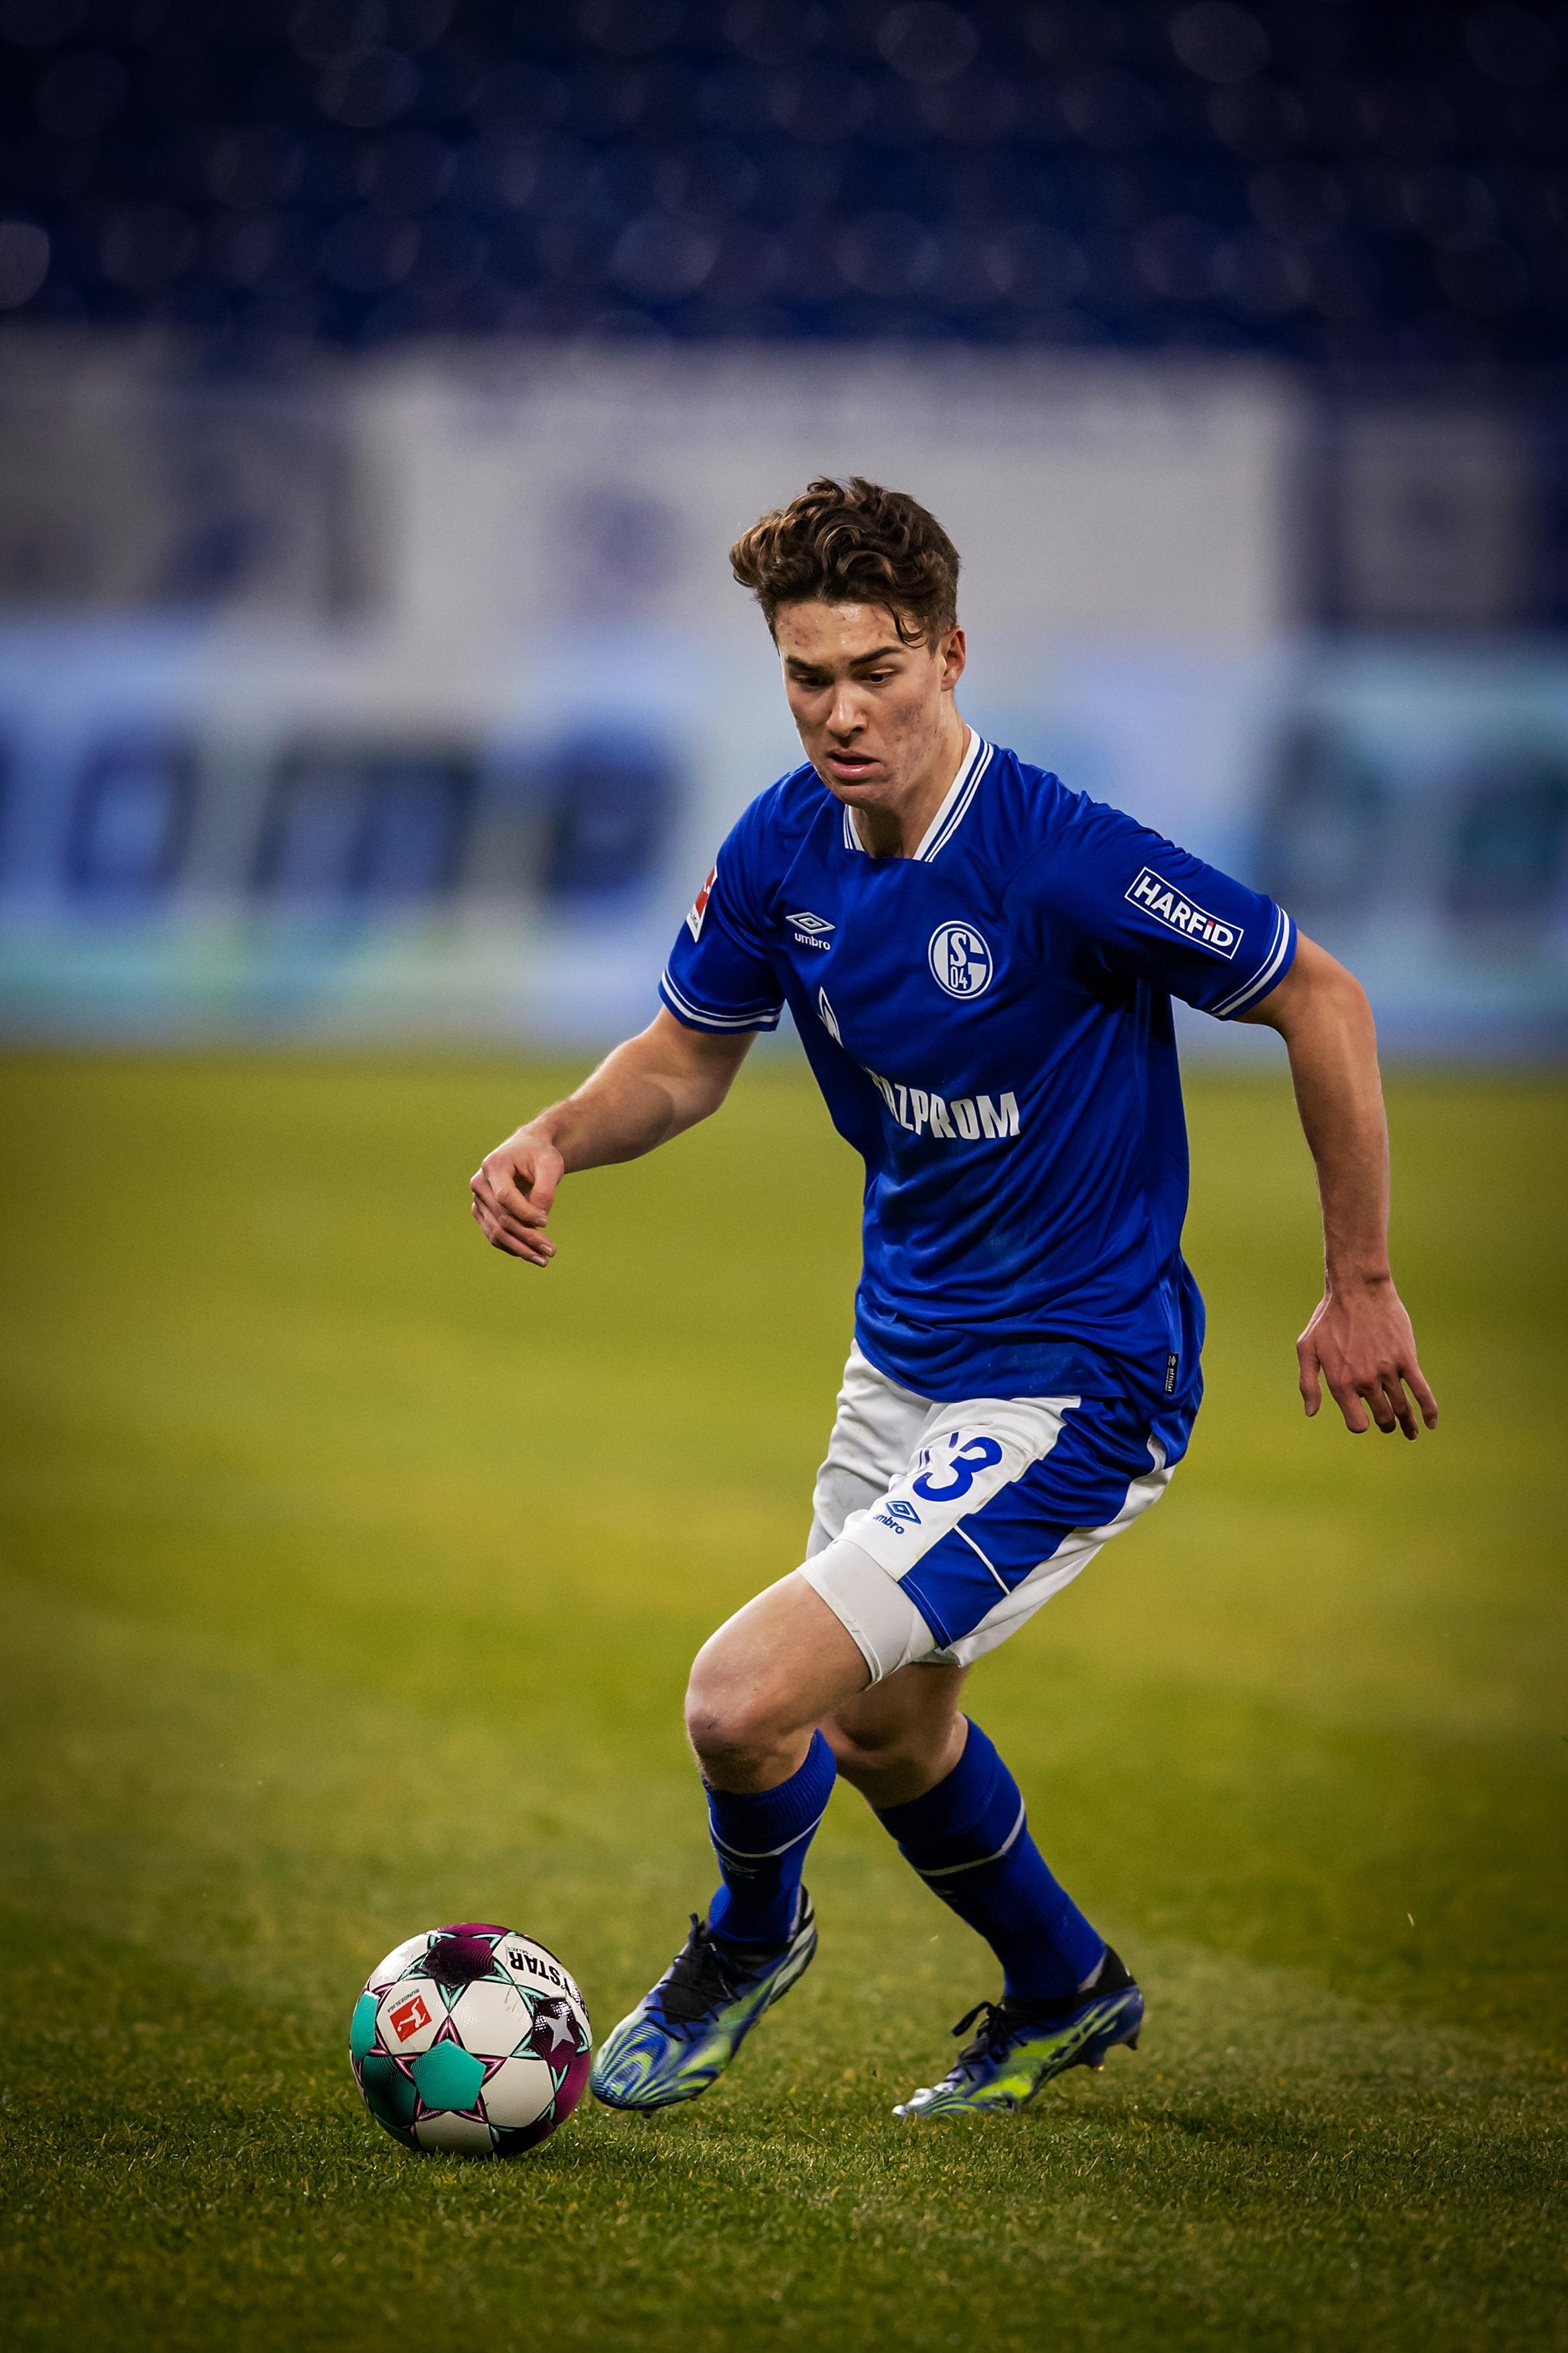 FC Schalke 04 v RB Leipzig - Bundesliga for DFL